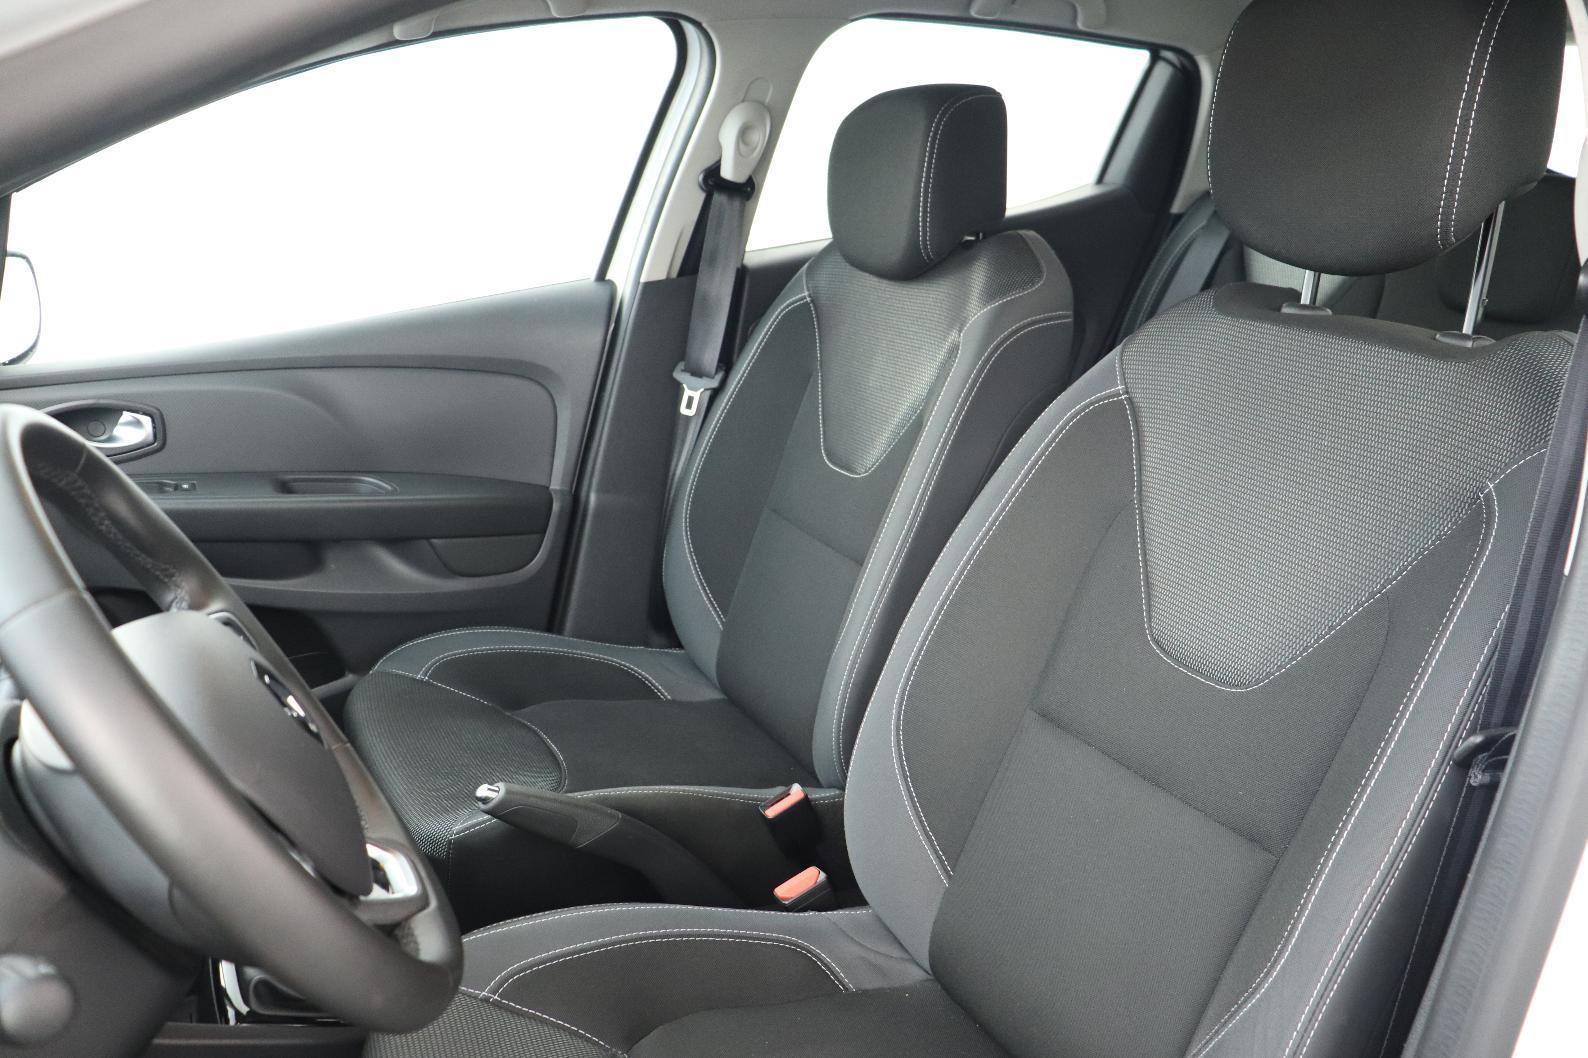 RENAULT CLIO IV BUSINESS Clio TCe 75 E6C Business